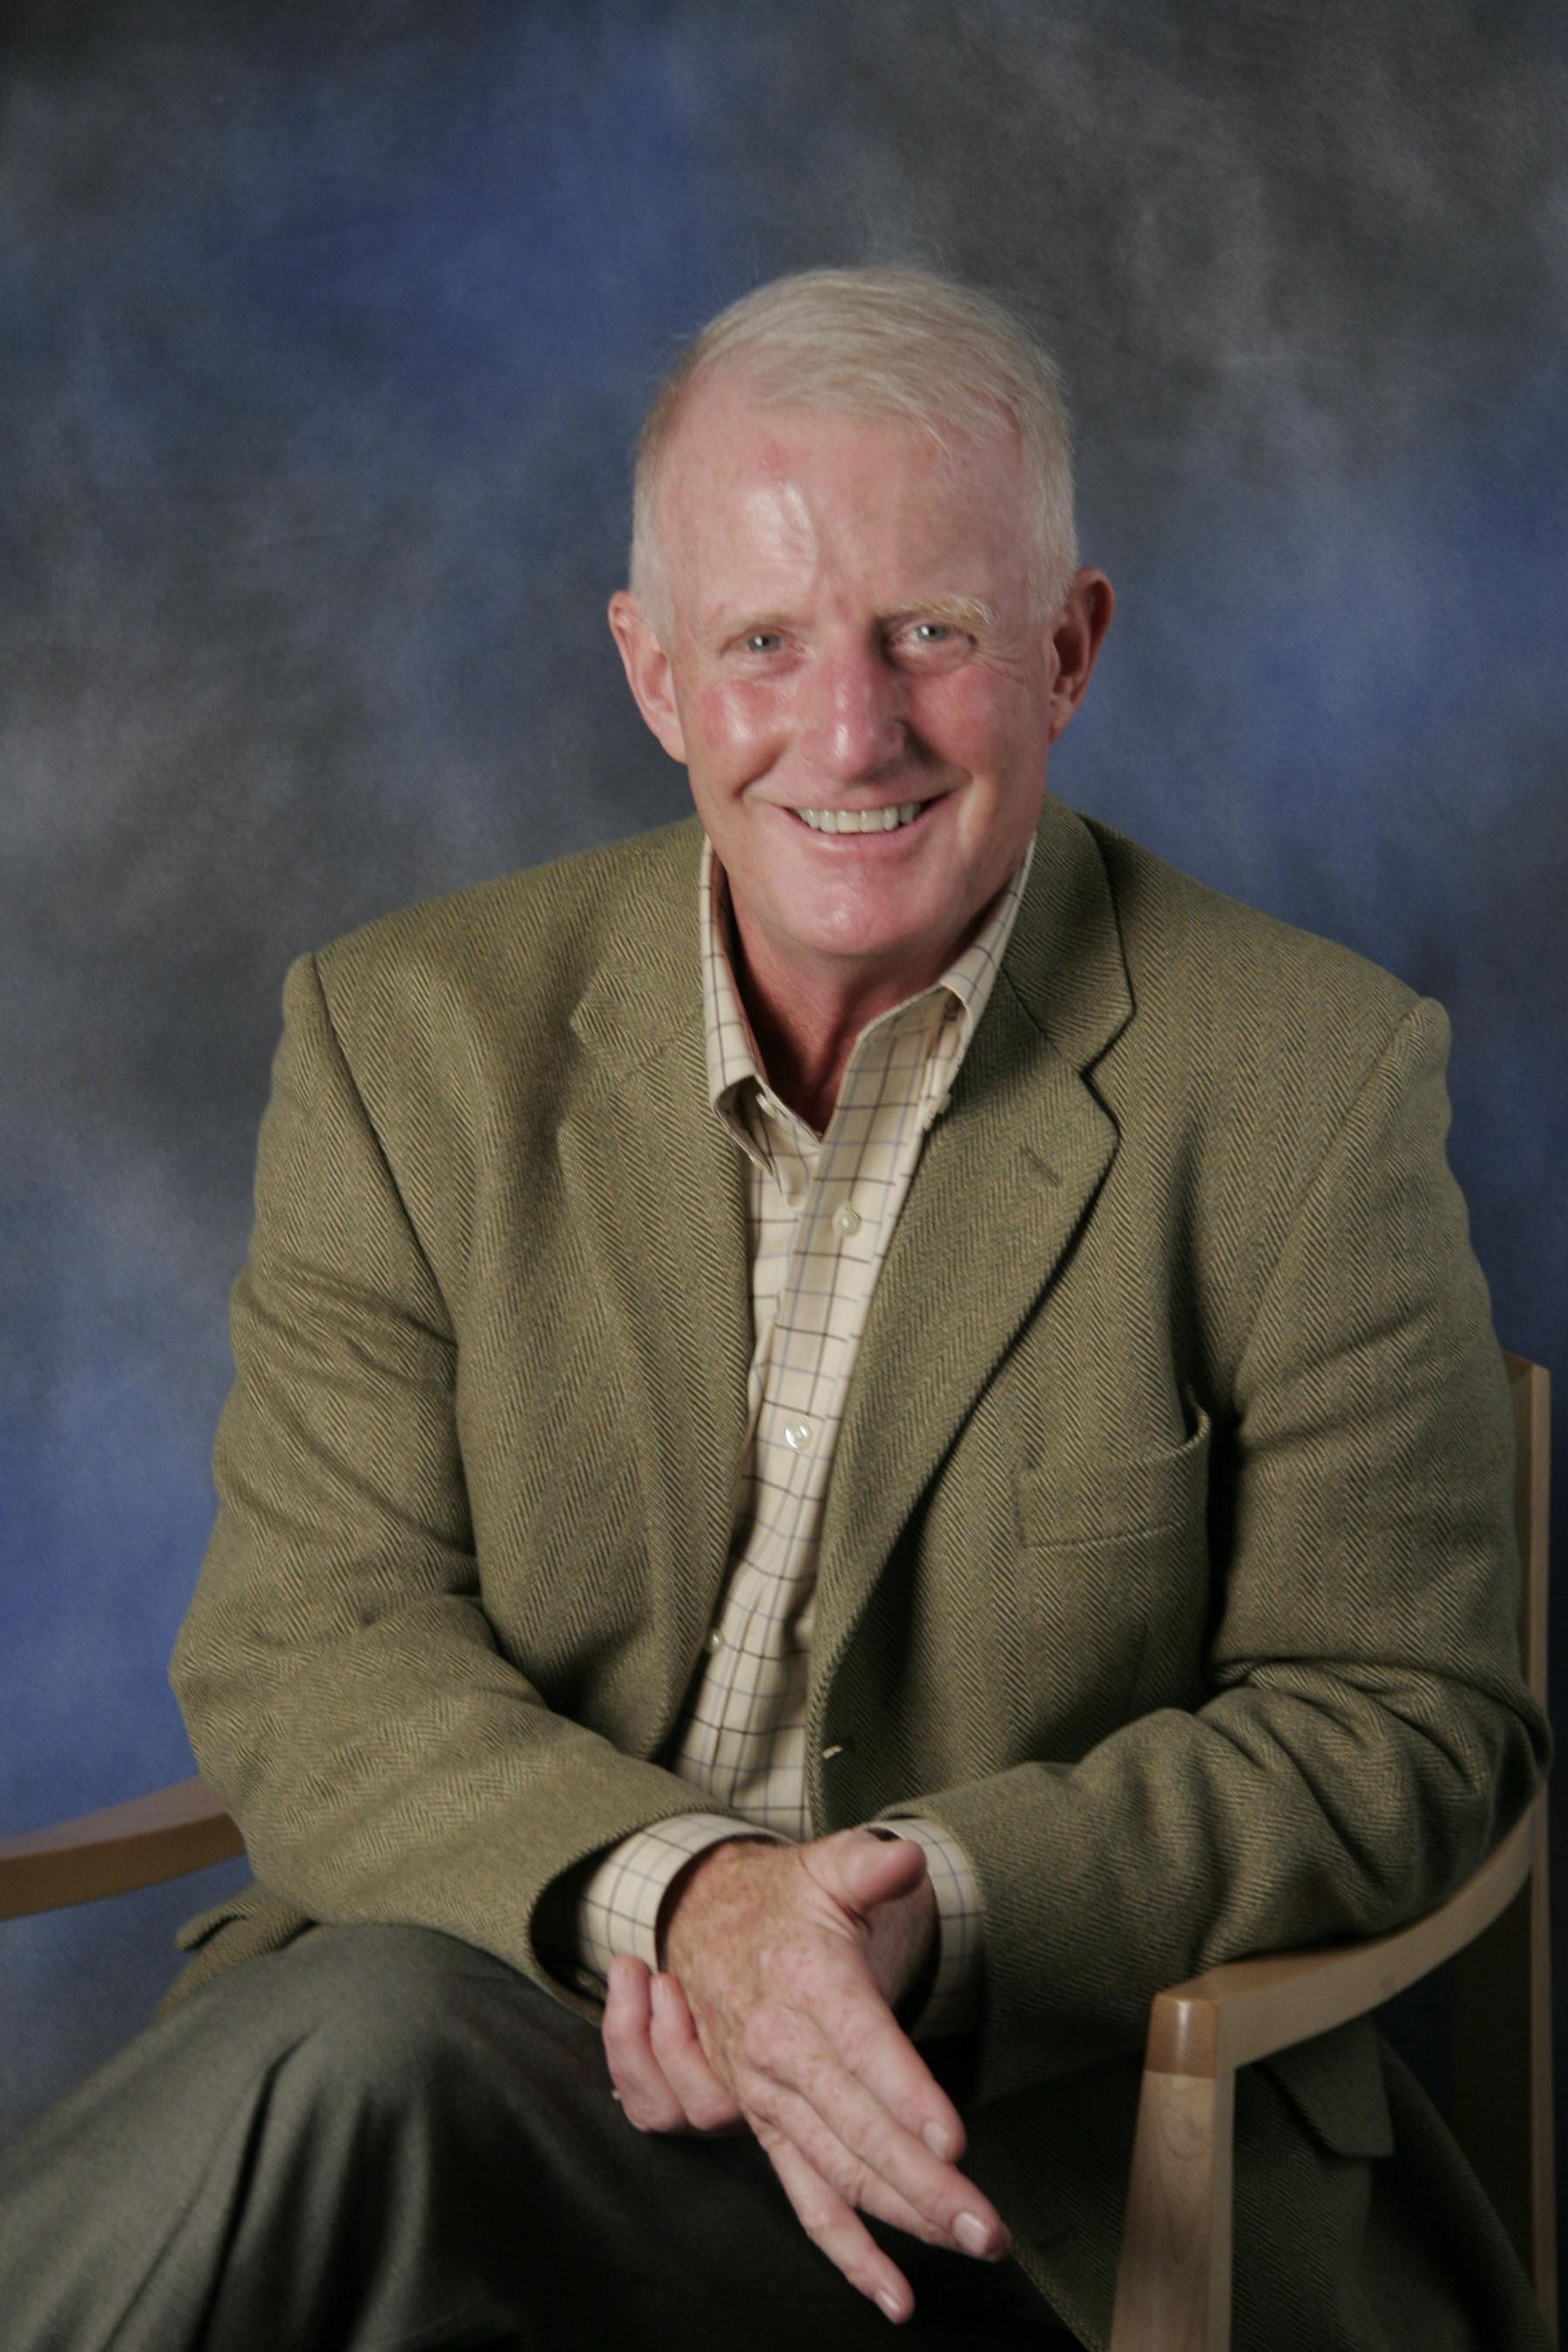 PR Newswire Mourns The Loss of Visionary John M. Williams.  (PRNewsFoto/PR Newswire Association LLC)